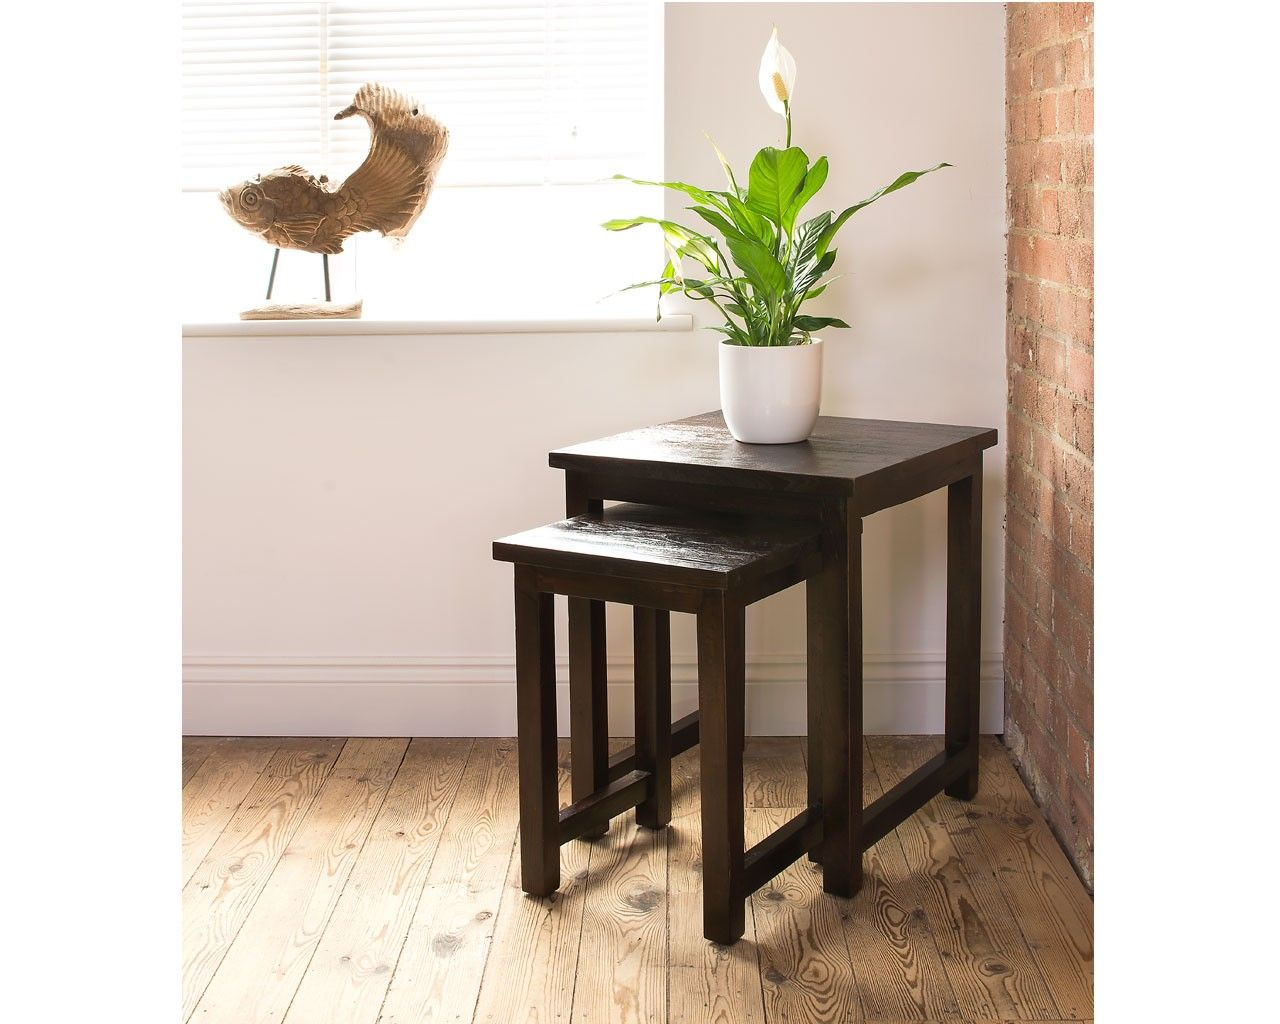 Teak Living Room Furniture Henry Dark Teak Nest Teak Furniture Is Perfect For The Living